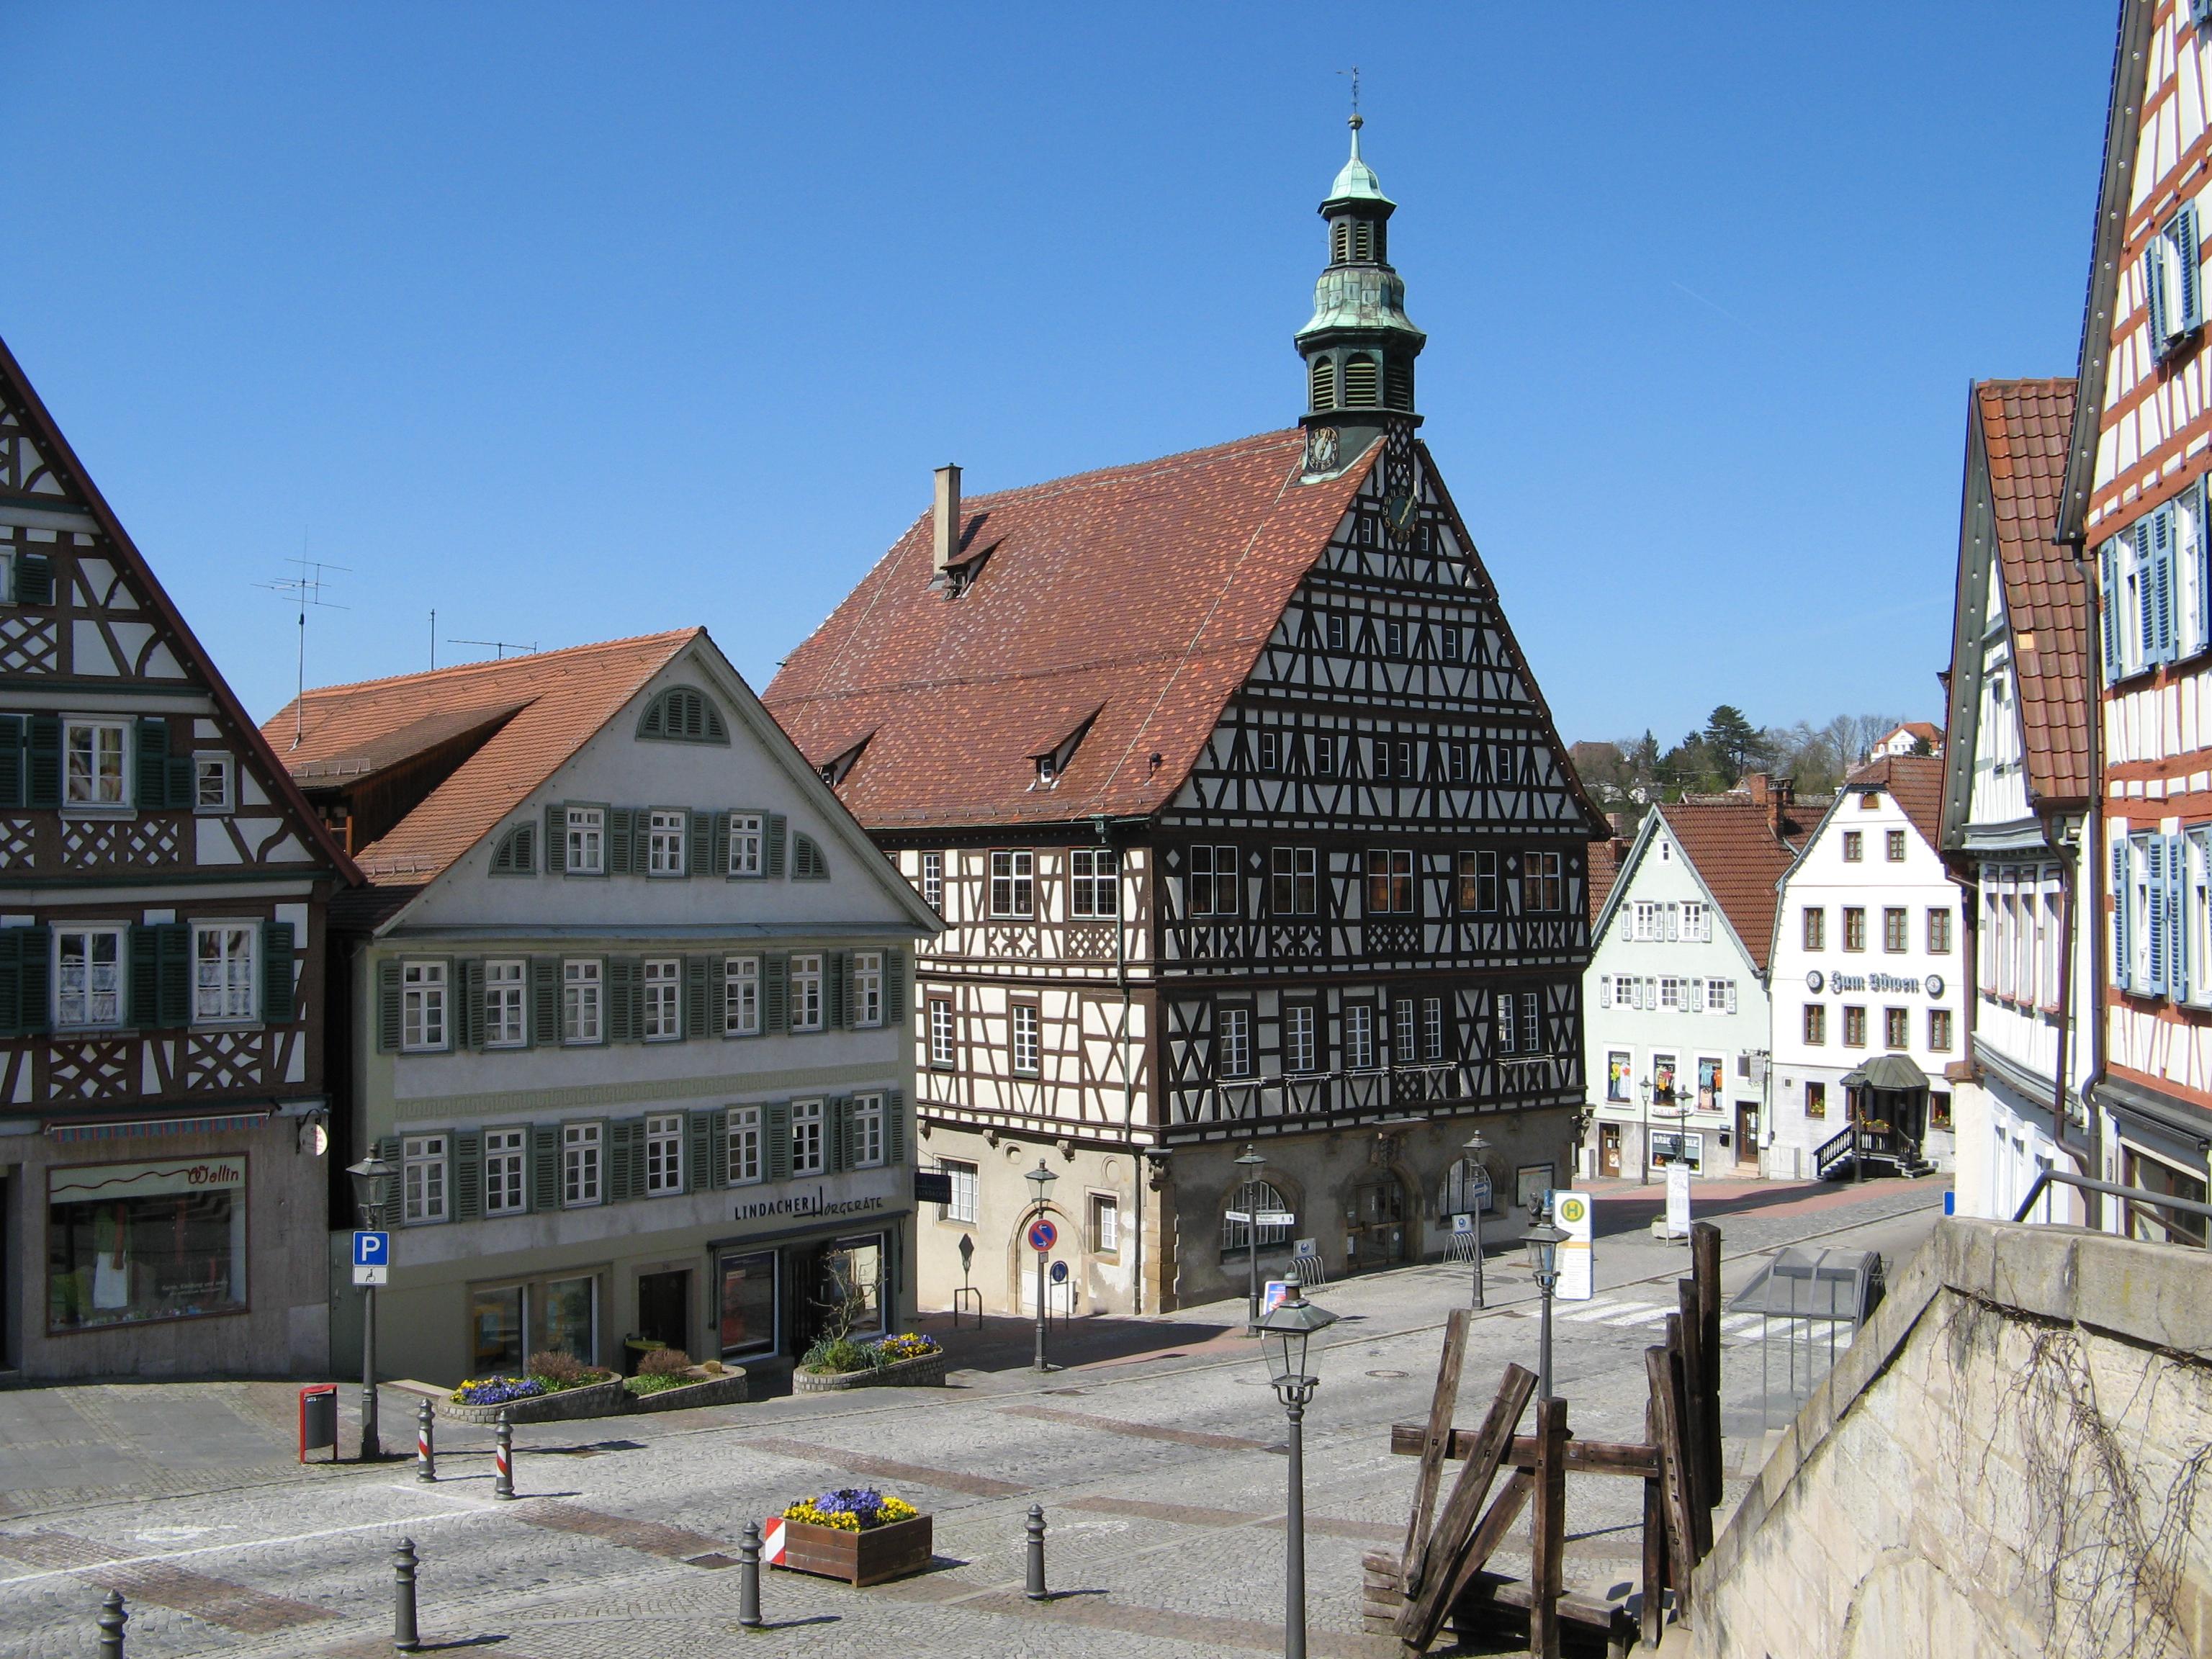 Backnang Germany  city pictures gallery : Description Backnang Marktstrasse